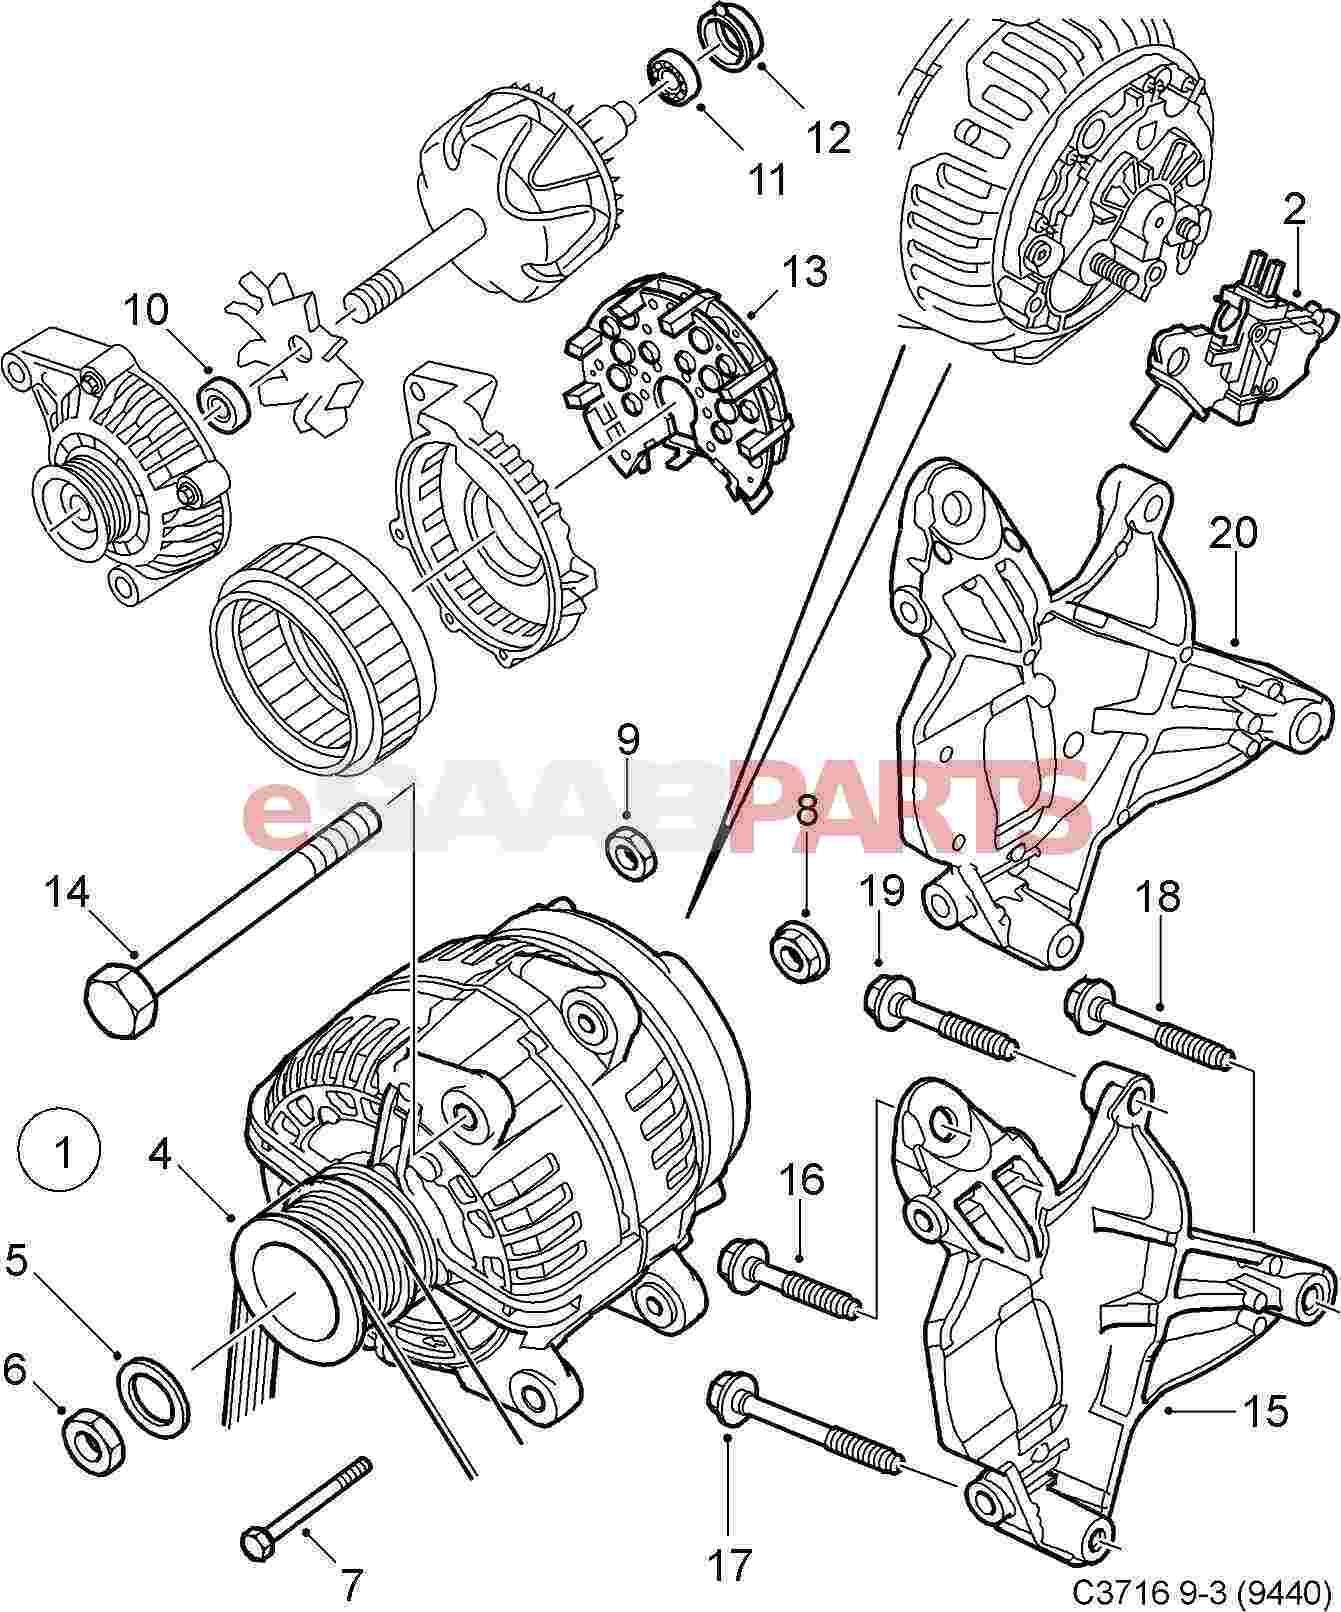 53466 saab 9 3 alternator part diagram wiring diagram library